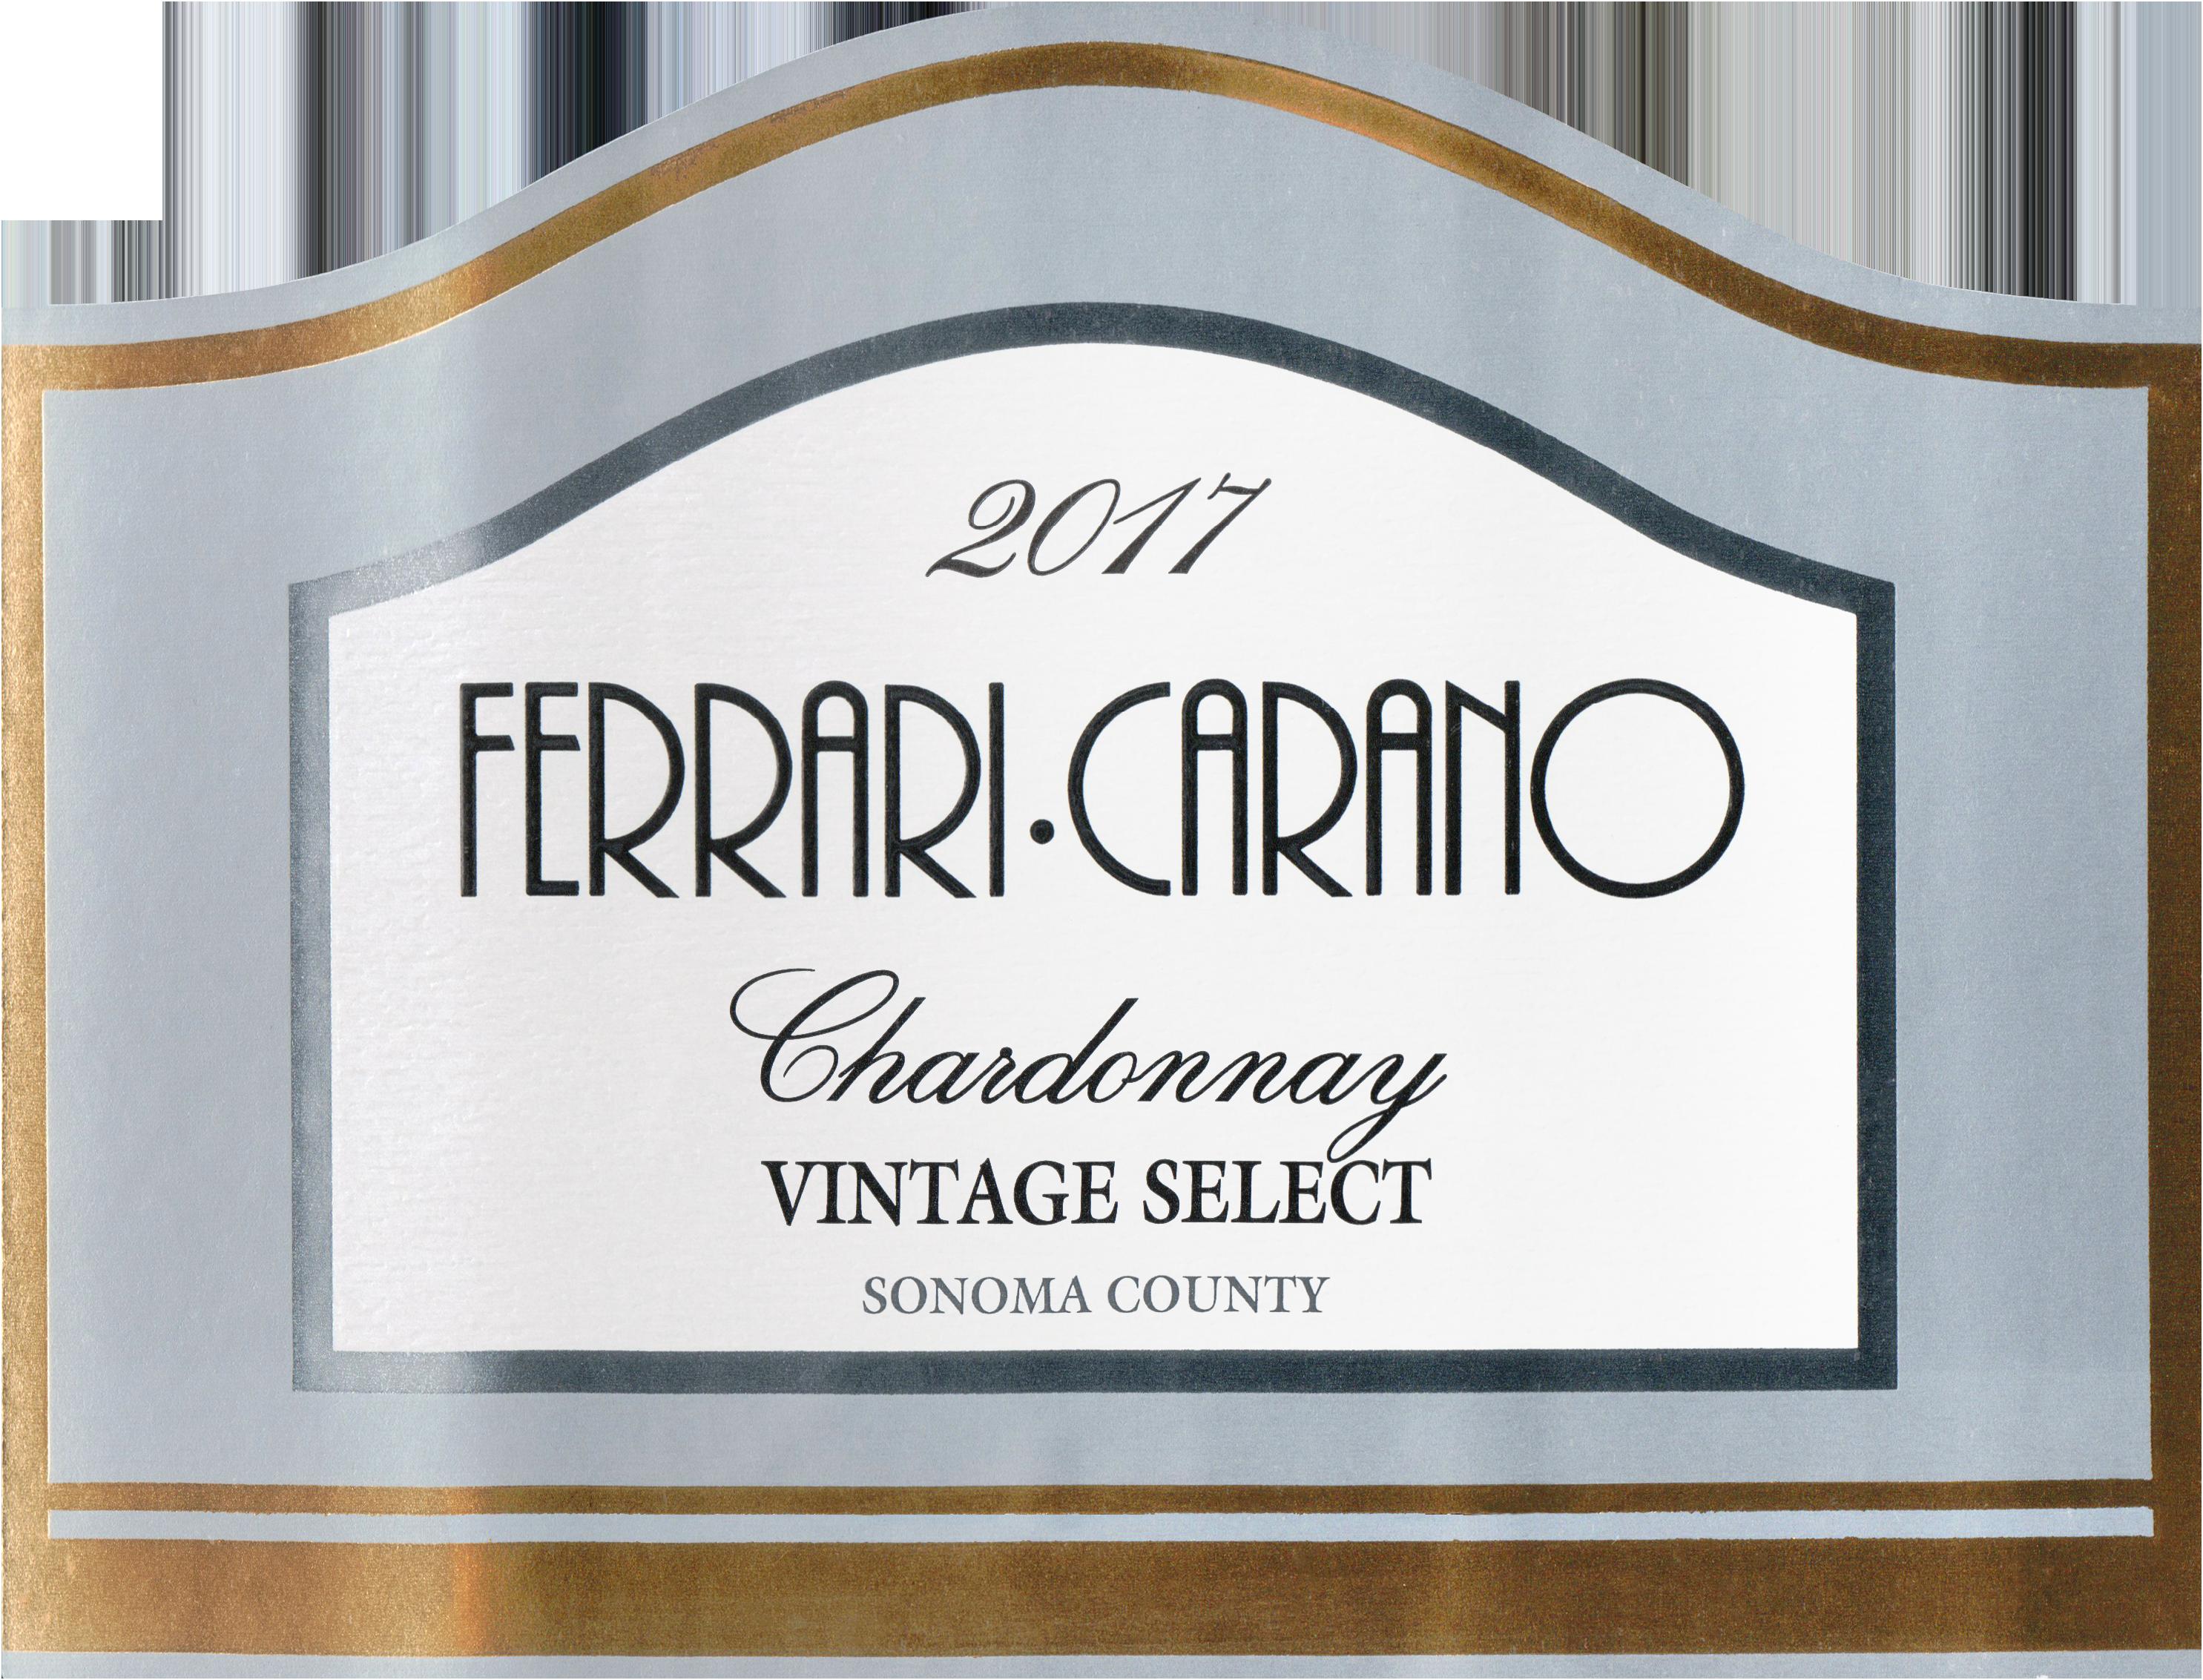 2017 Ferrari Carano Chardonnay Wine Library